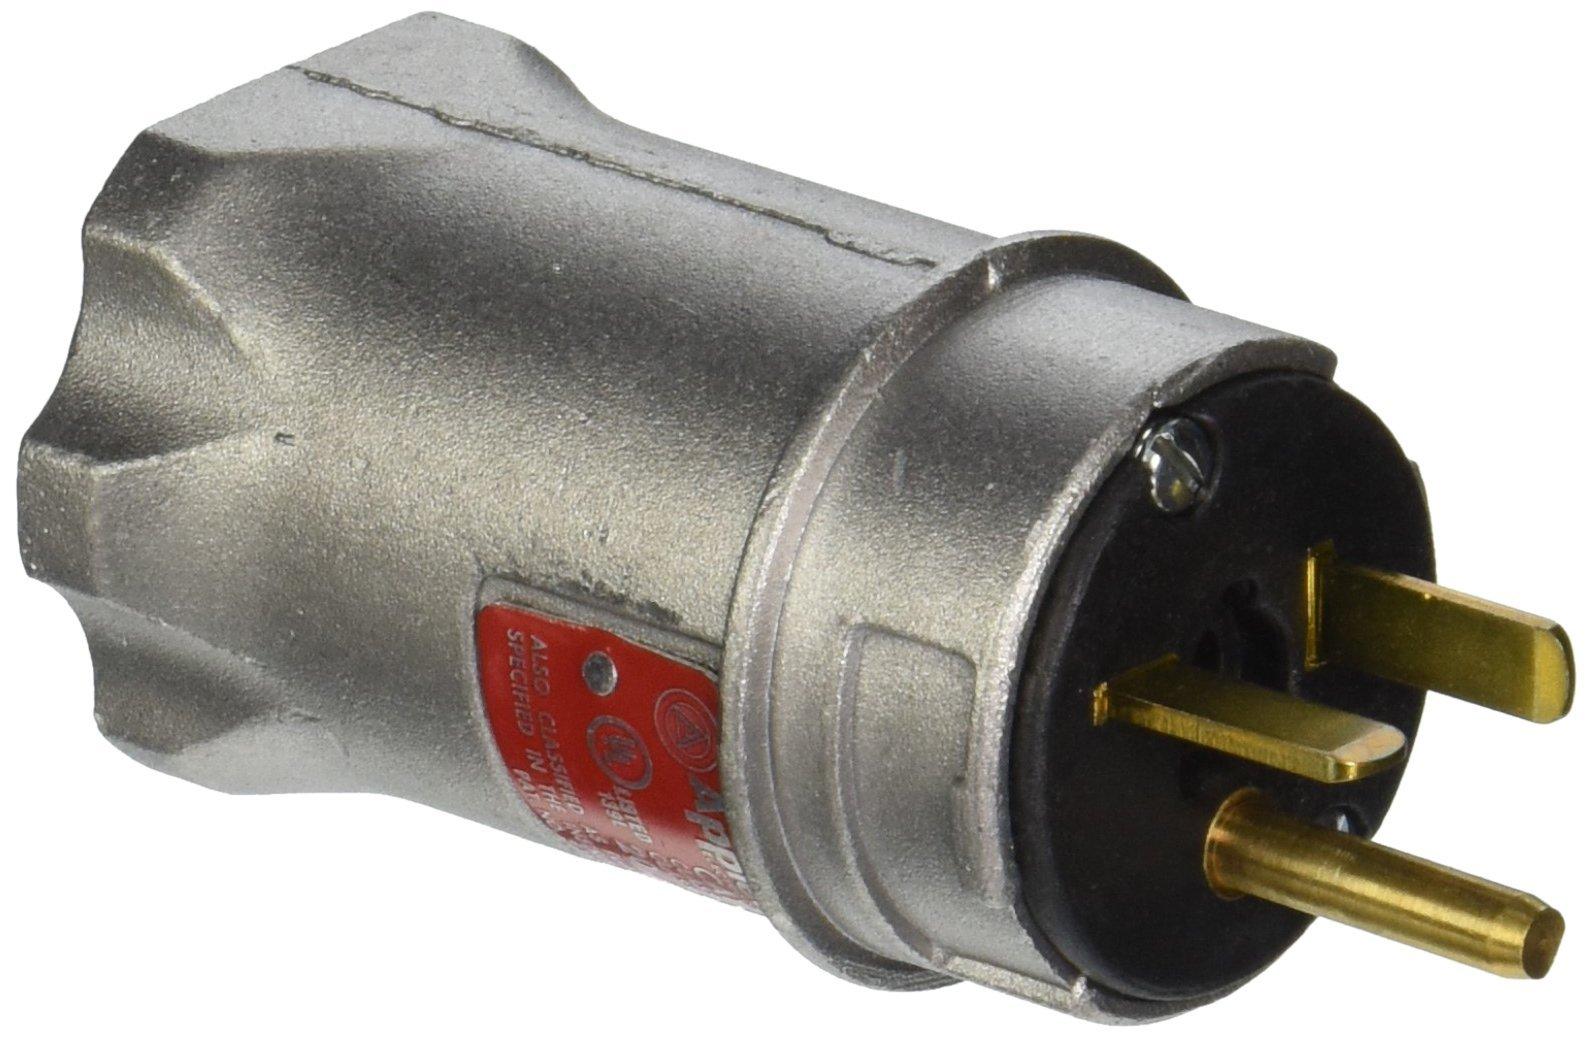 Appleton ECP-20232 Plug, 250, 20A, 2W, 3P, 6-20P by Appleton